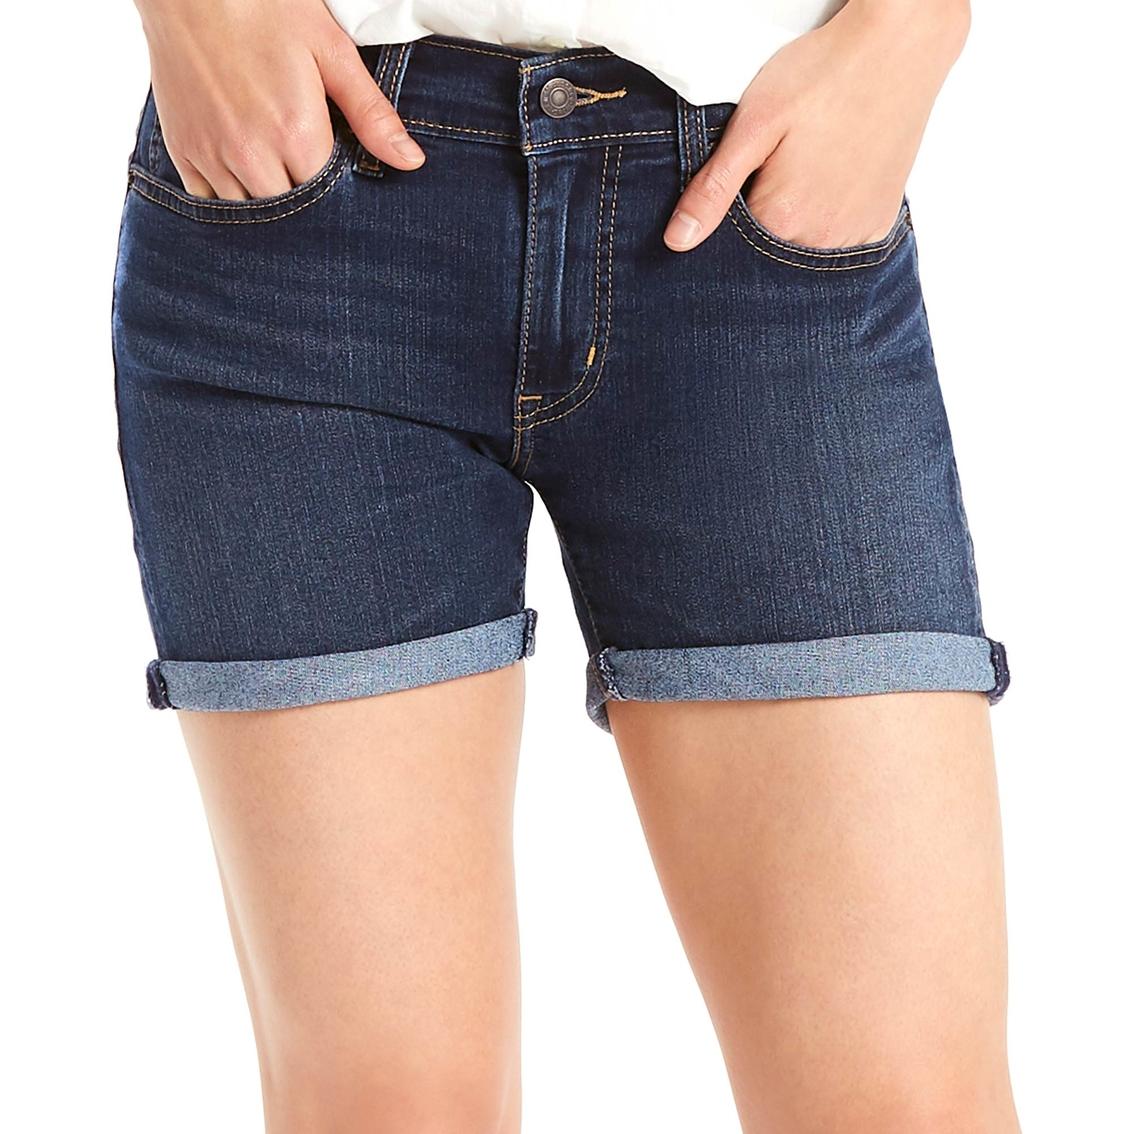 945ef6536a0 Levi s Women s Mid Length Denim Shorts